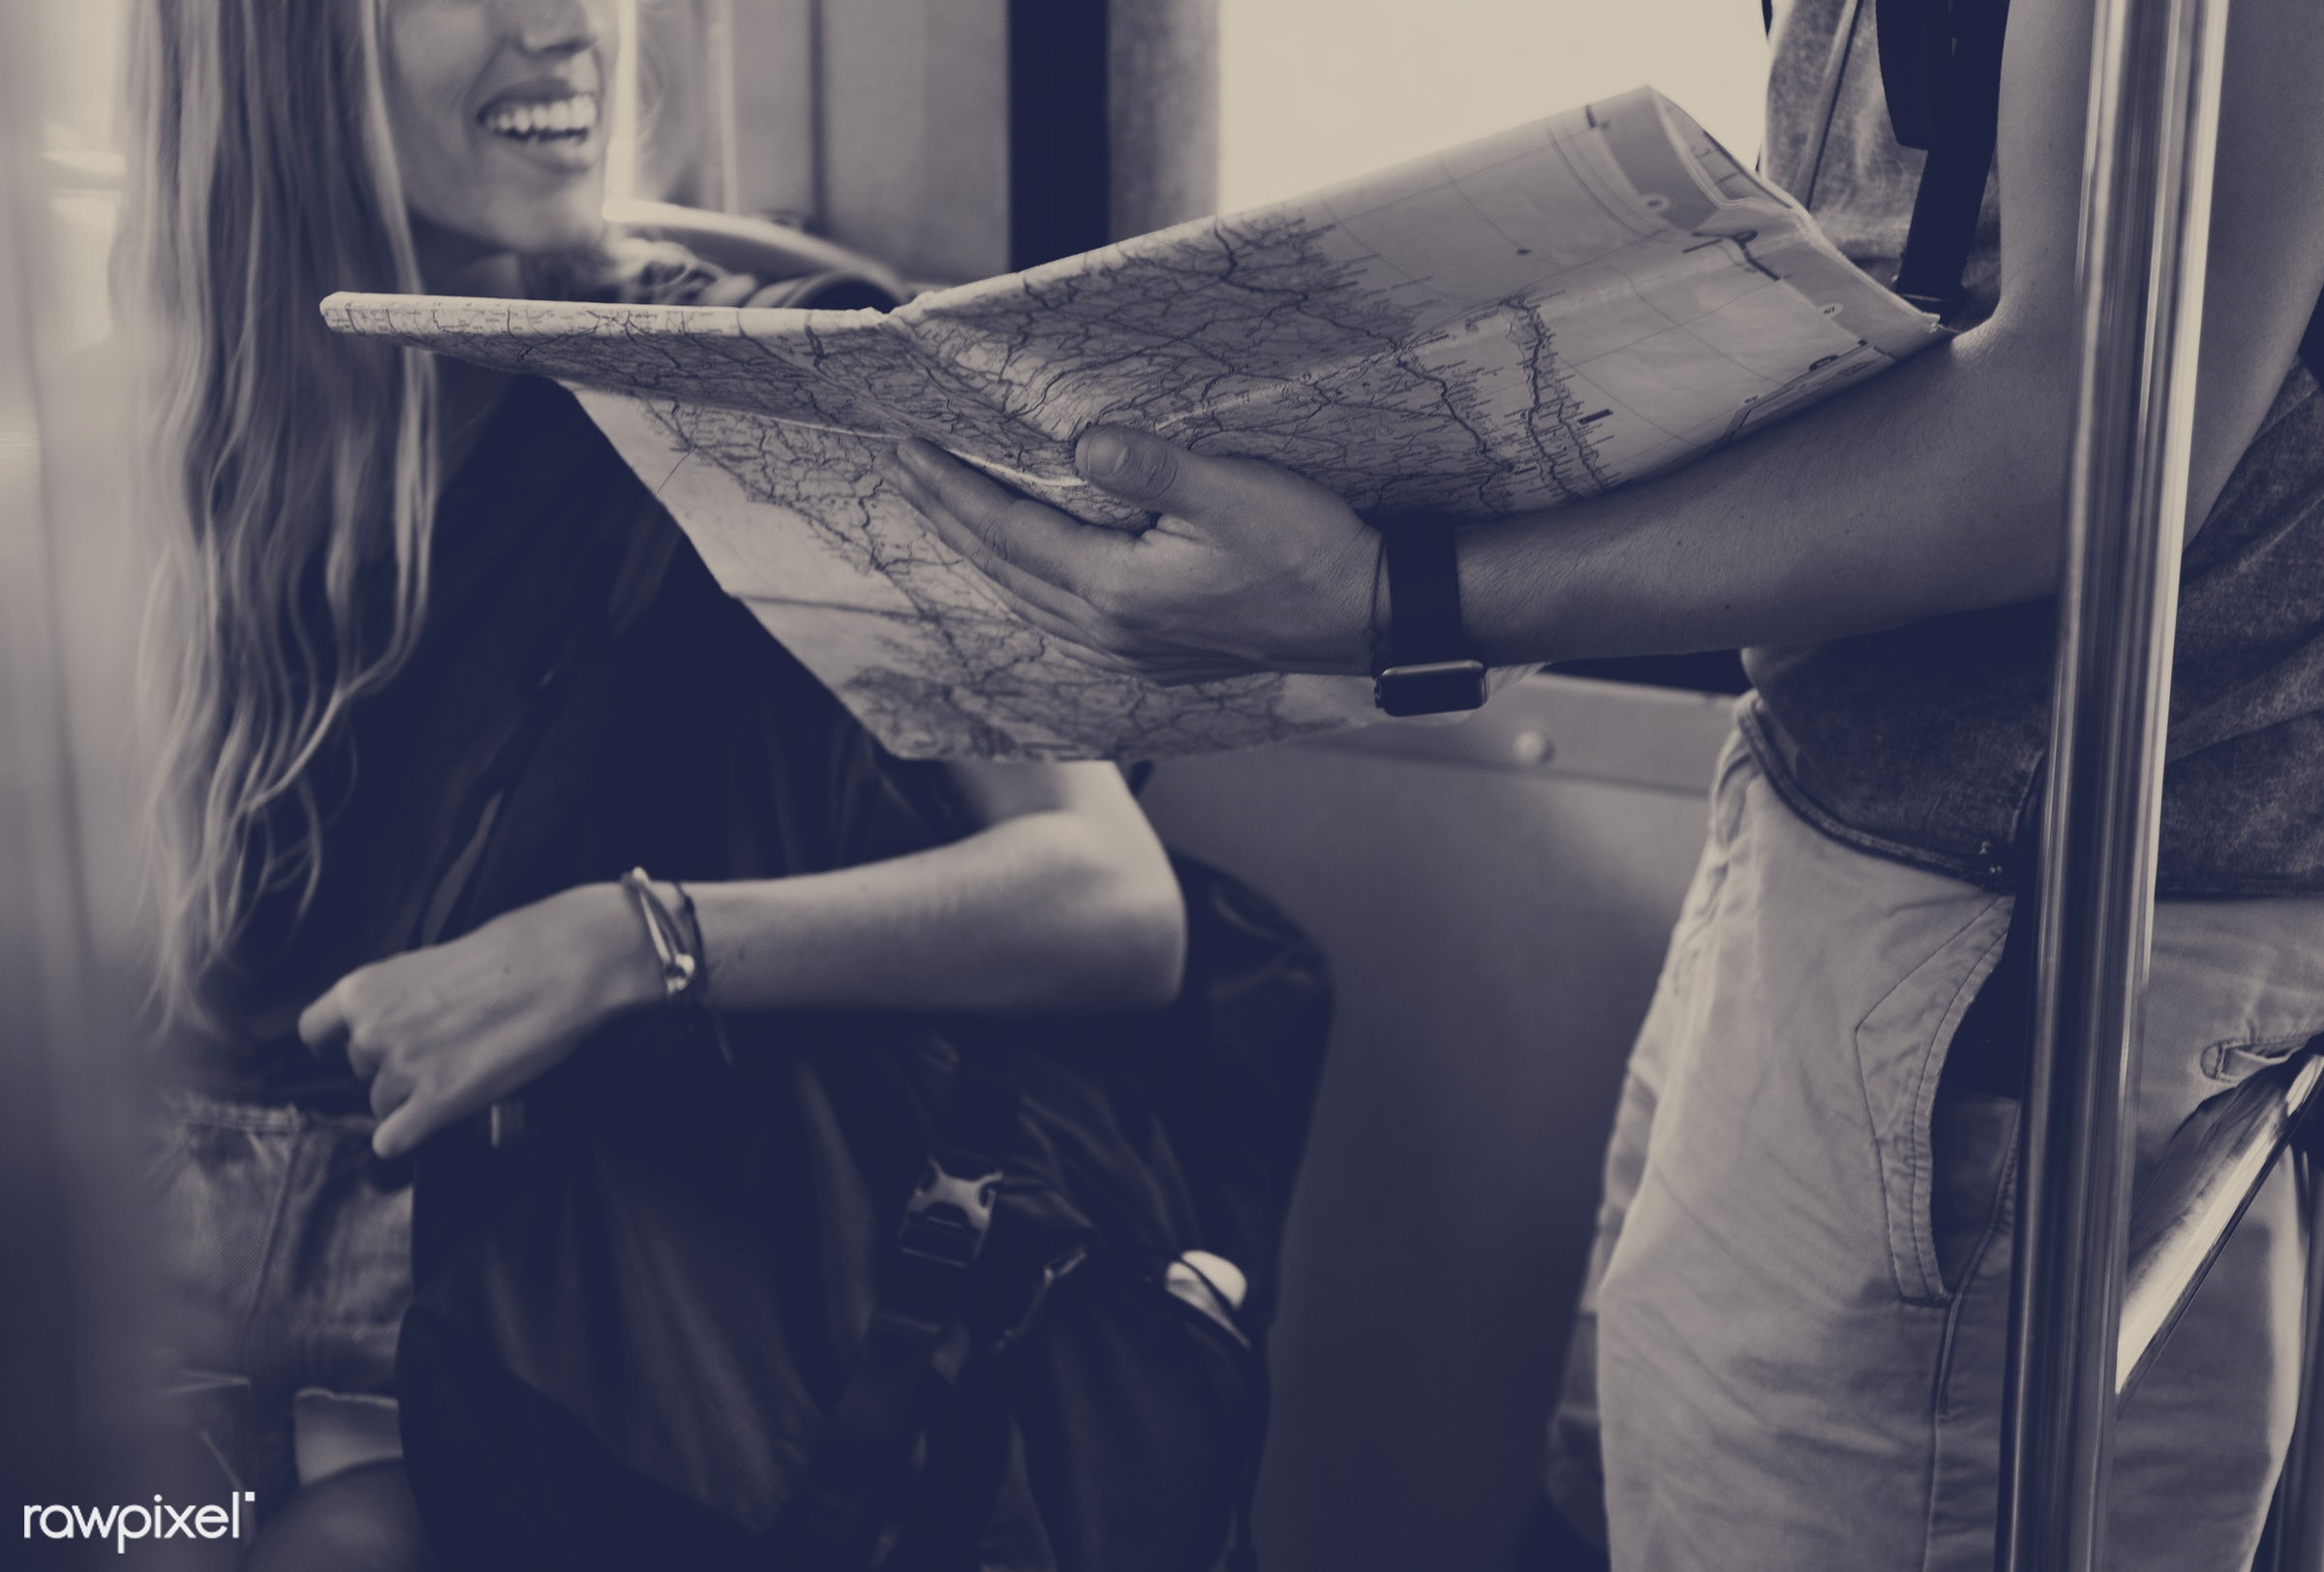 guide, backpackers, travel, people, wanderlust, subway, girl, woman, map, commute, train, partner, couple, trip, man, guy,...